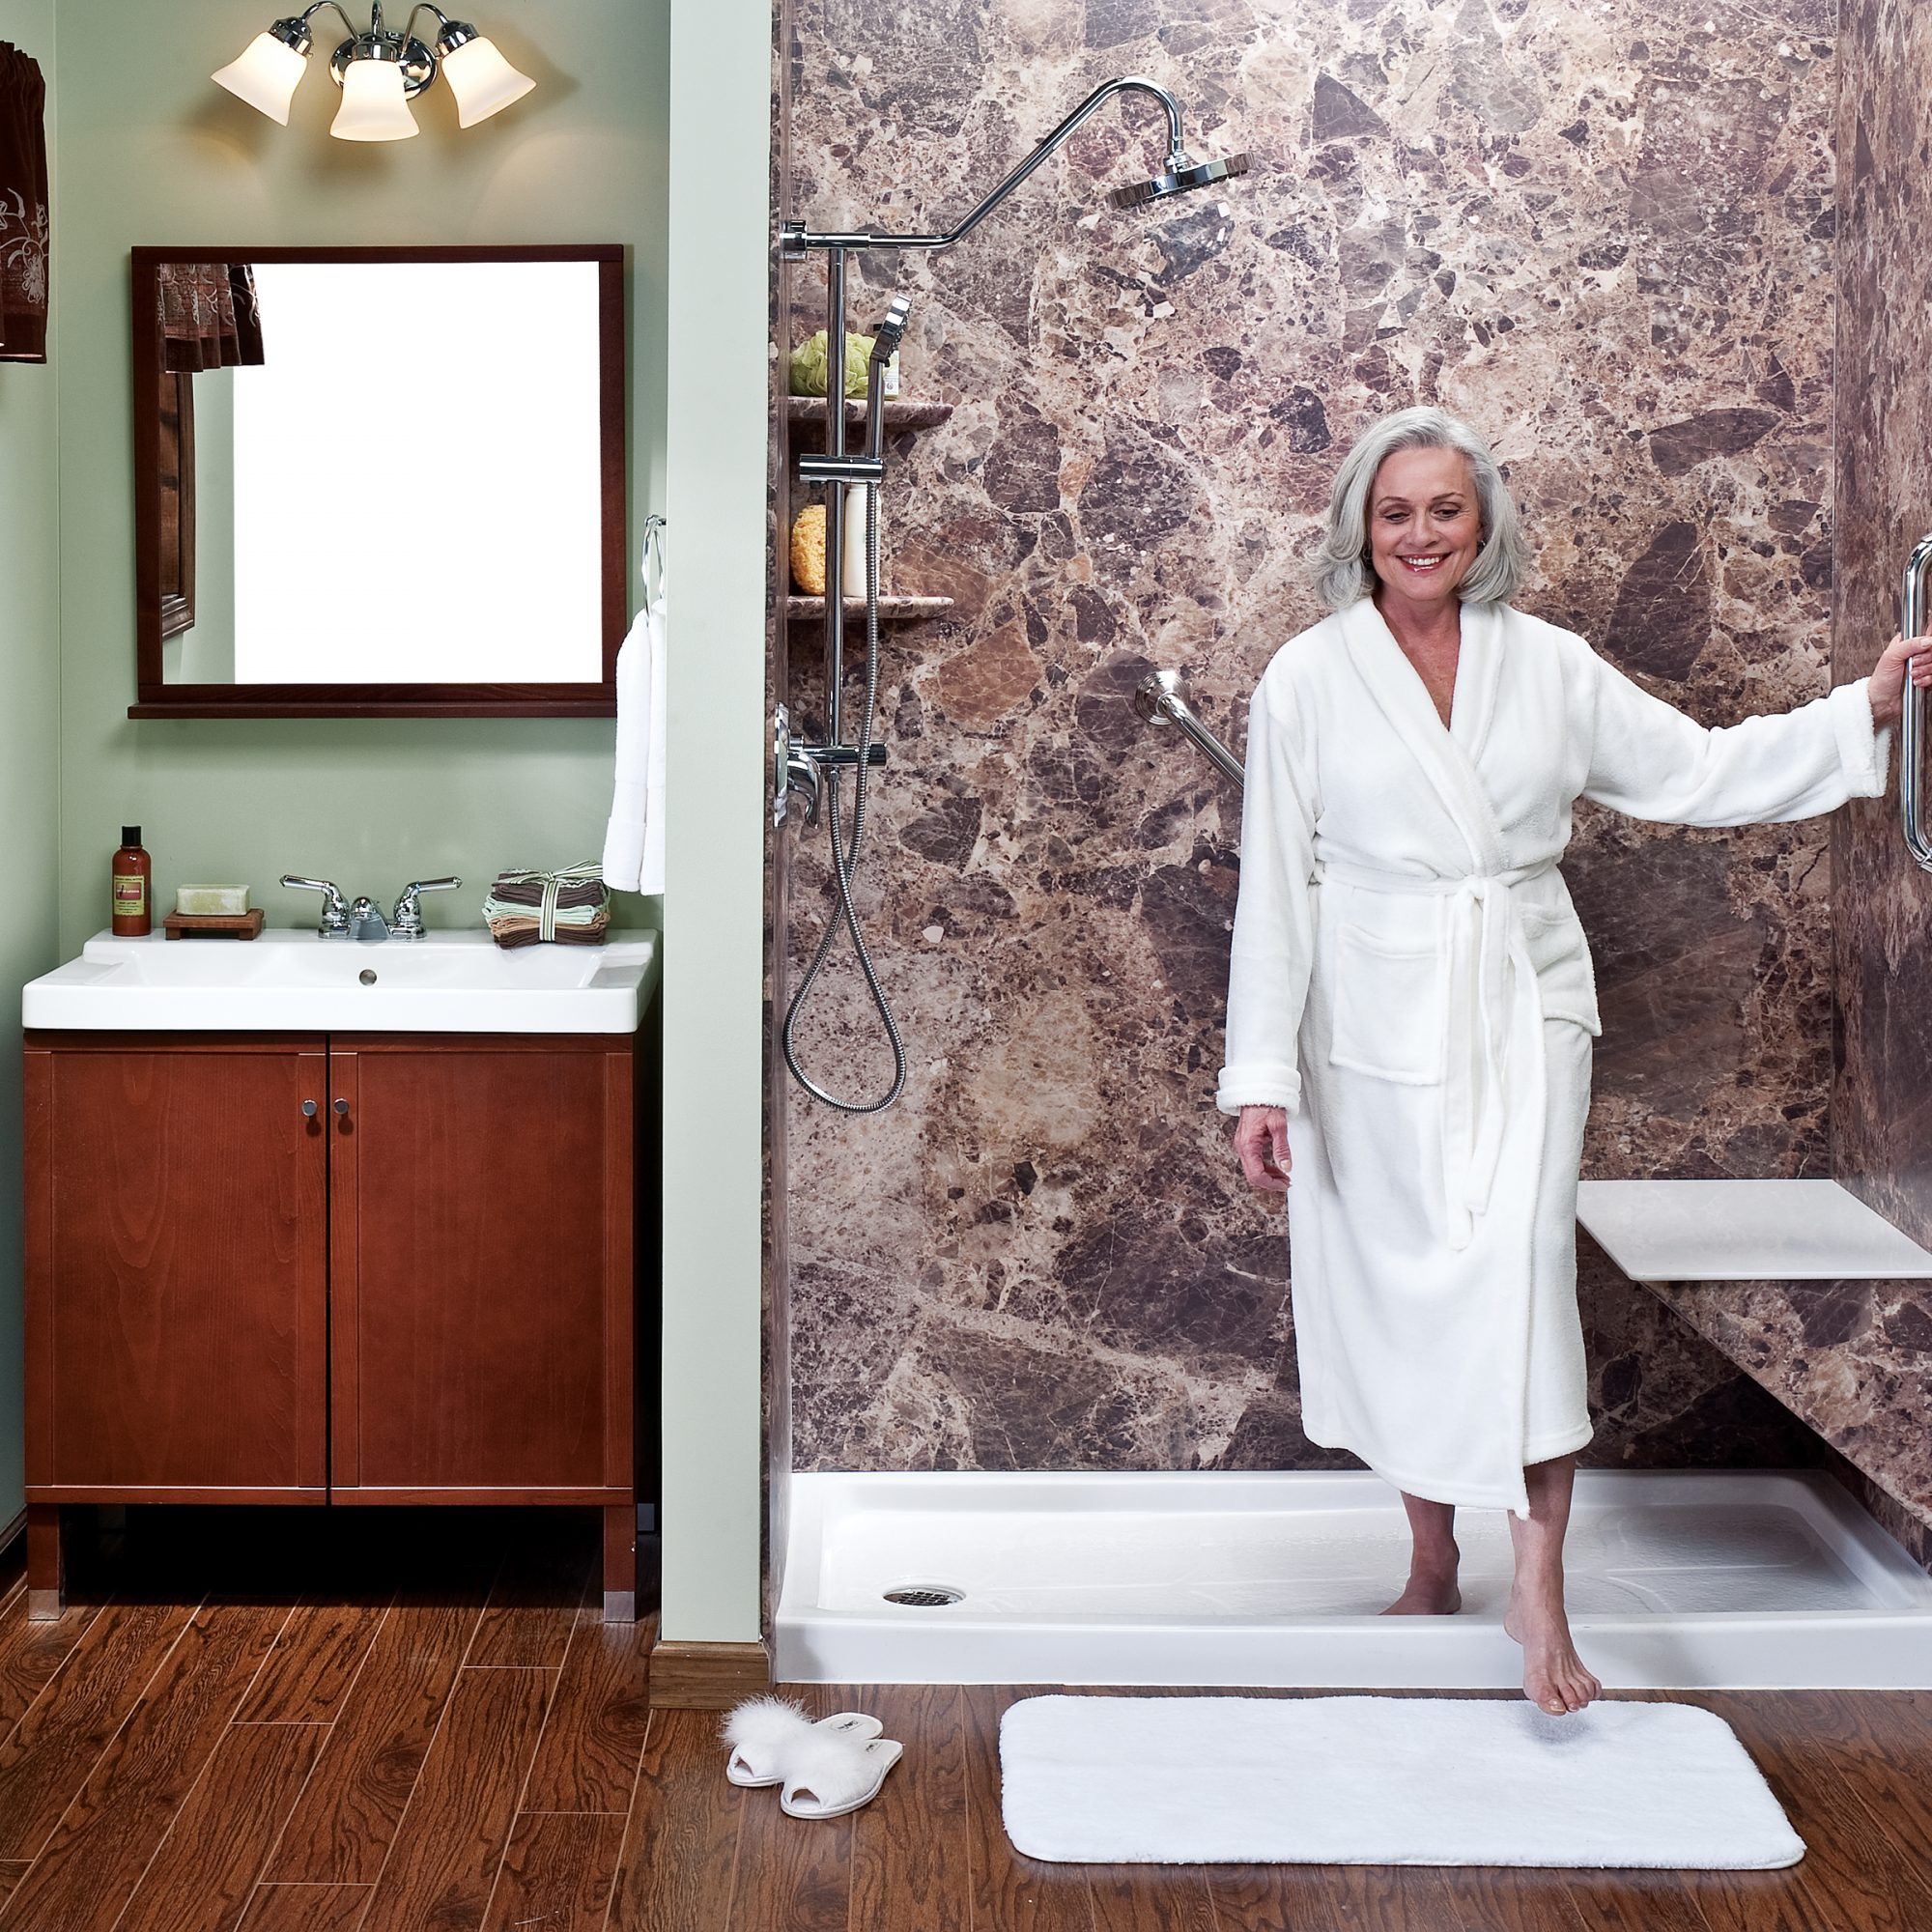 Bathroom Remodeling La Crosse Wi : Bathroom remodeling la crosse winona tomah viroqua